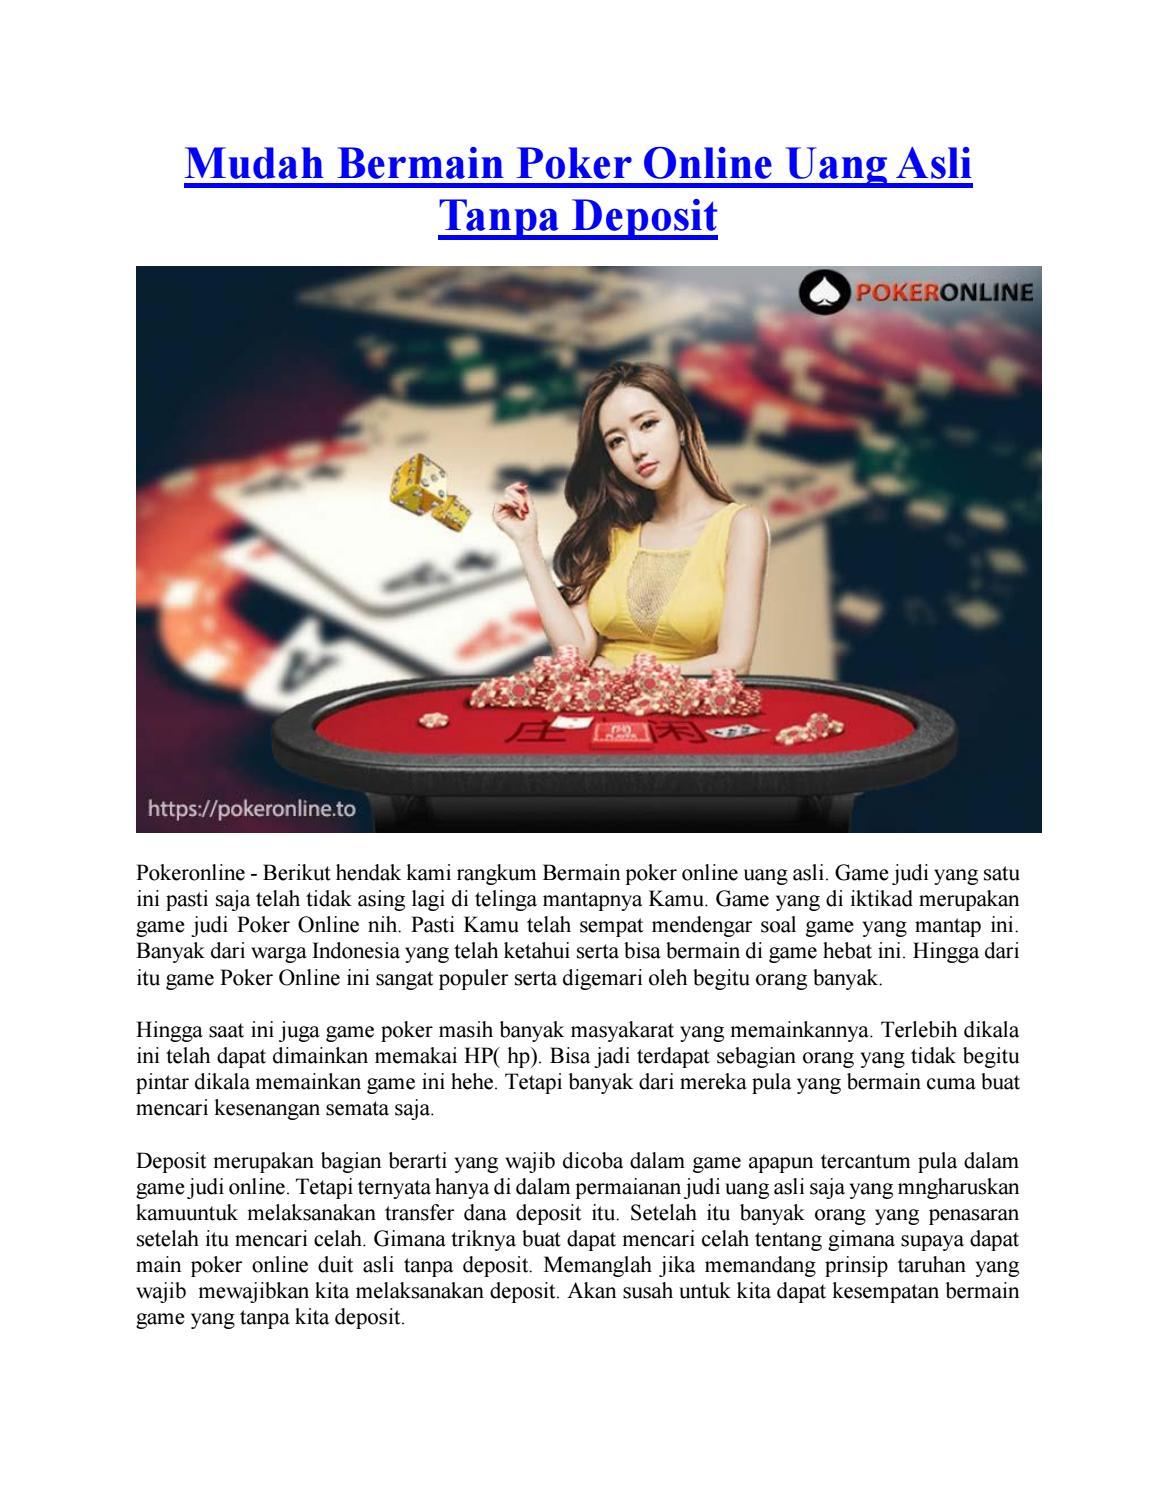 Mudah Bermain Poker Online Uang Asli Tanpa Deposit By Poker Online Issuu